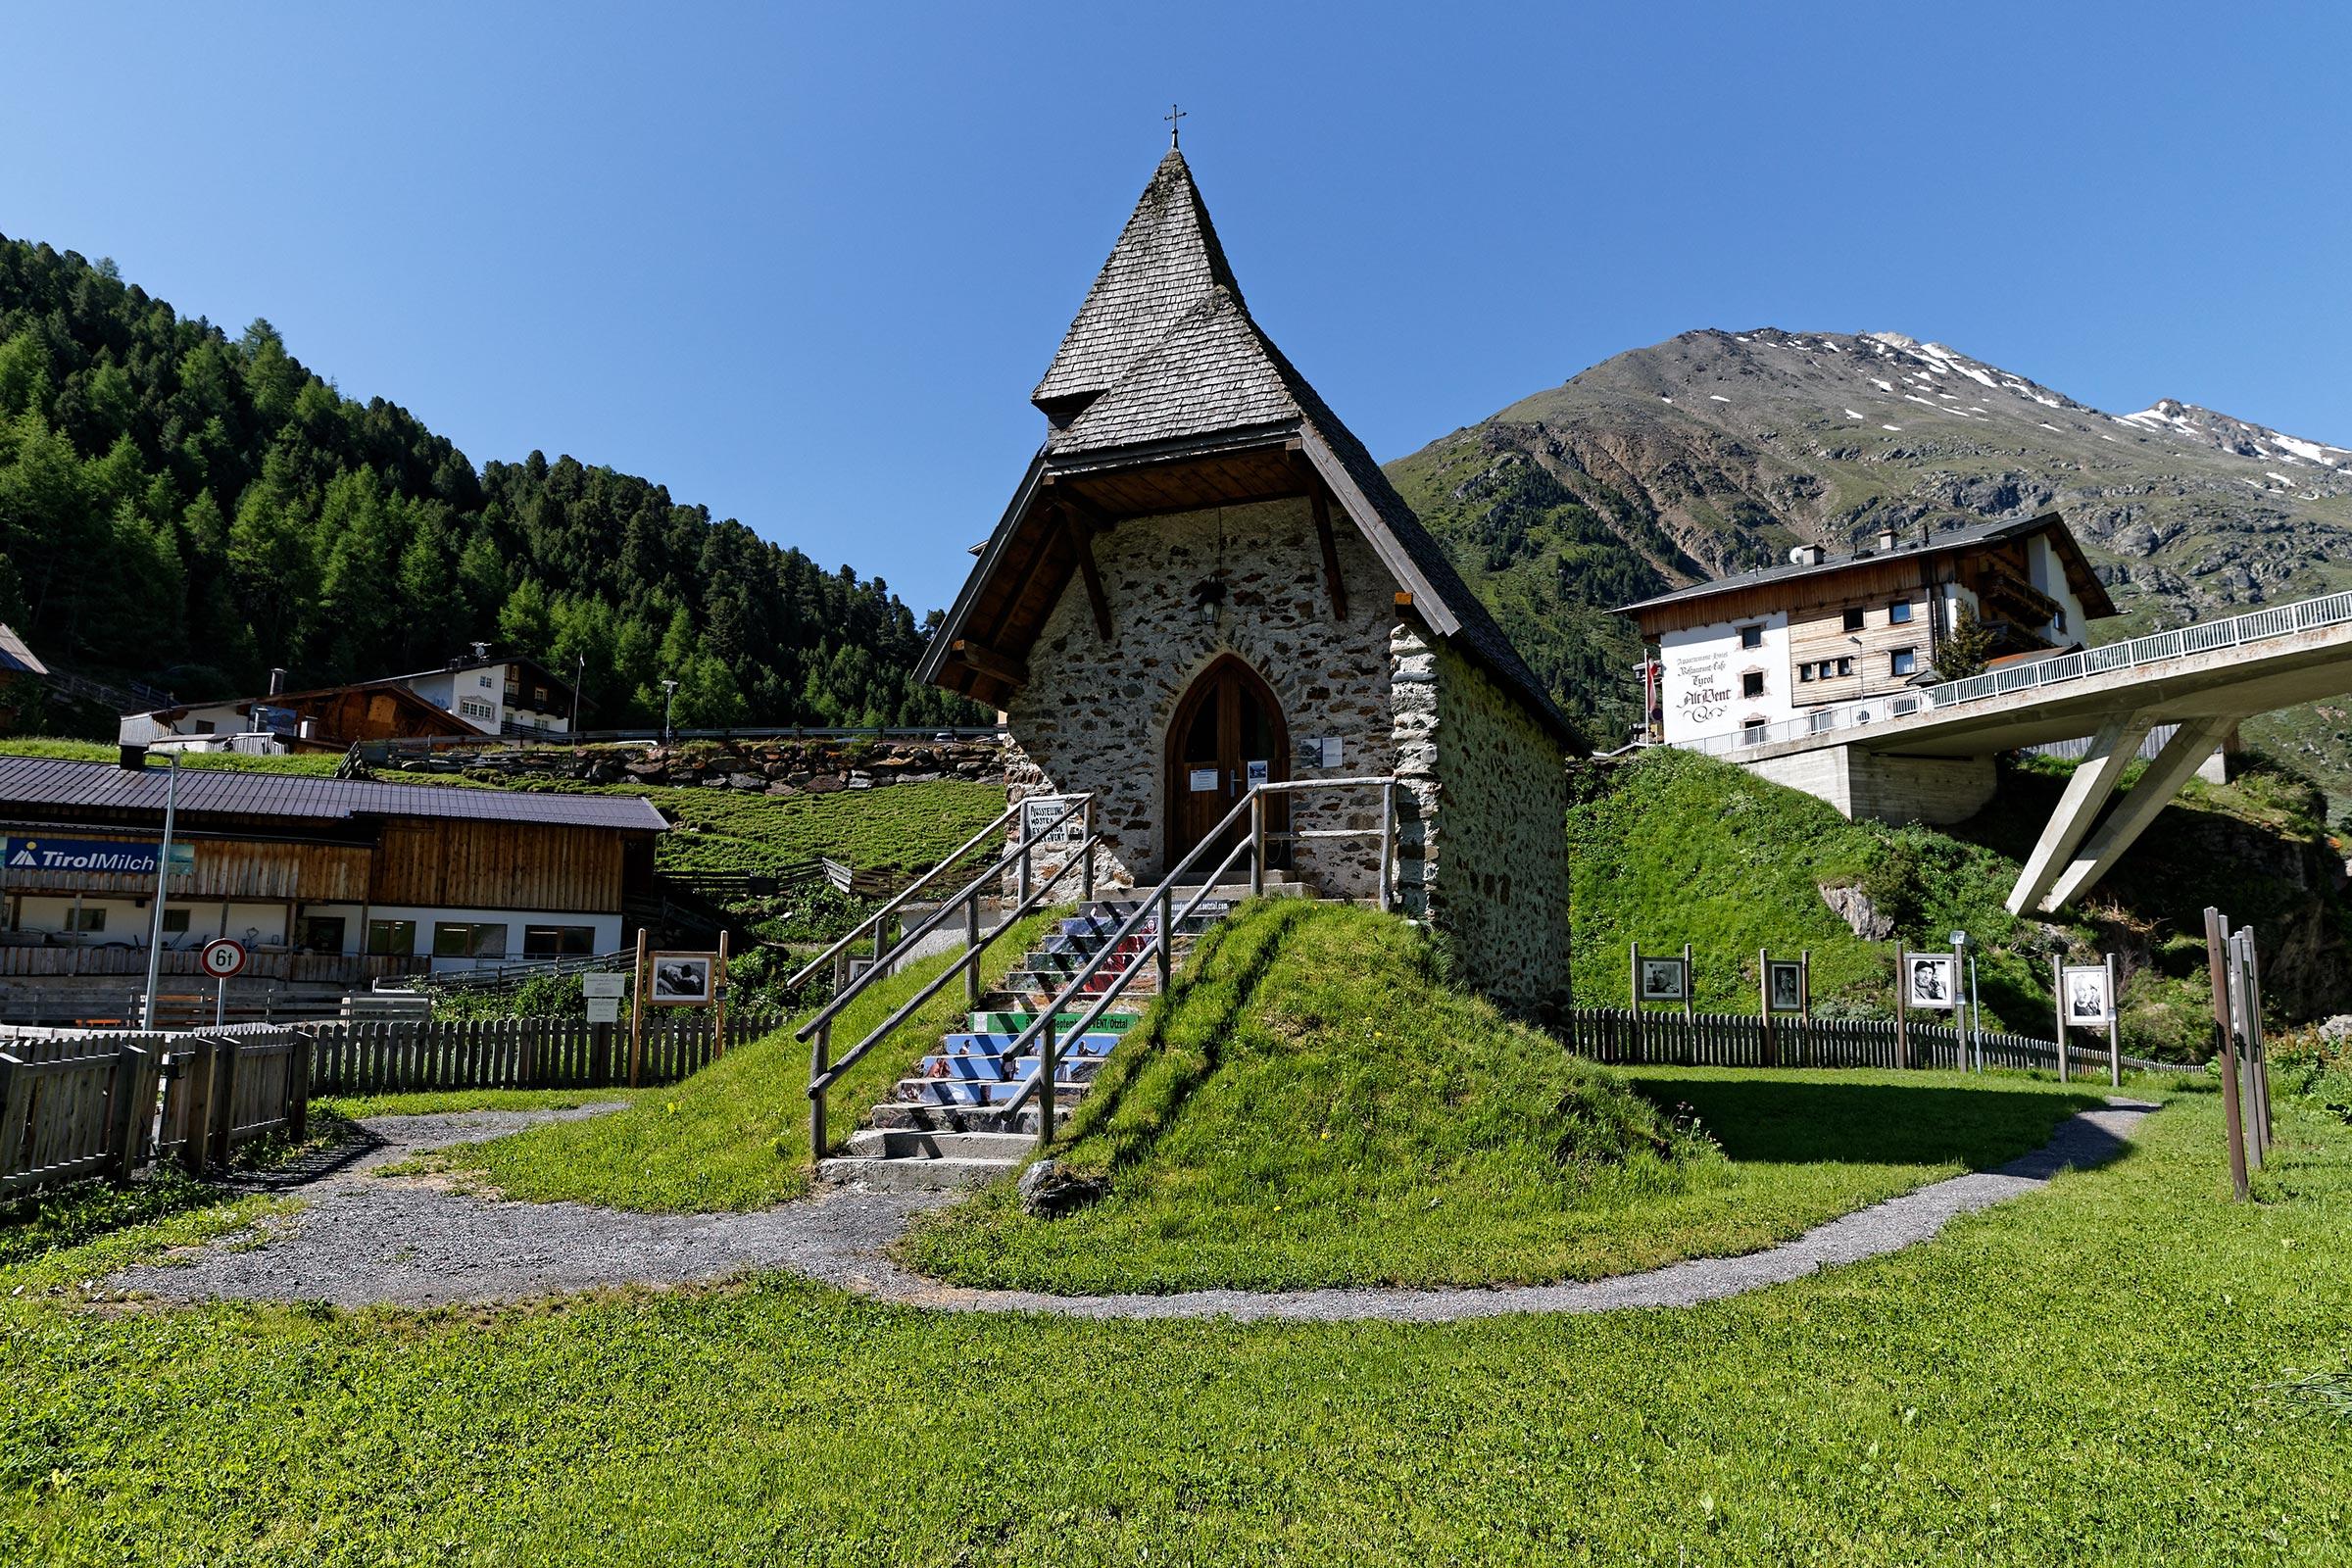 Bergsteigerkapelle in Vent - Ötztaler Urweg